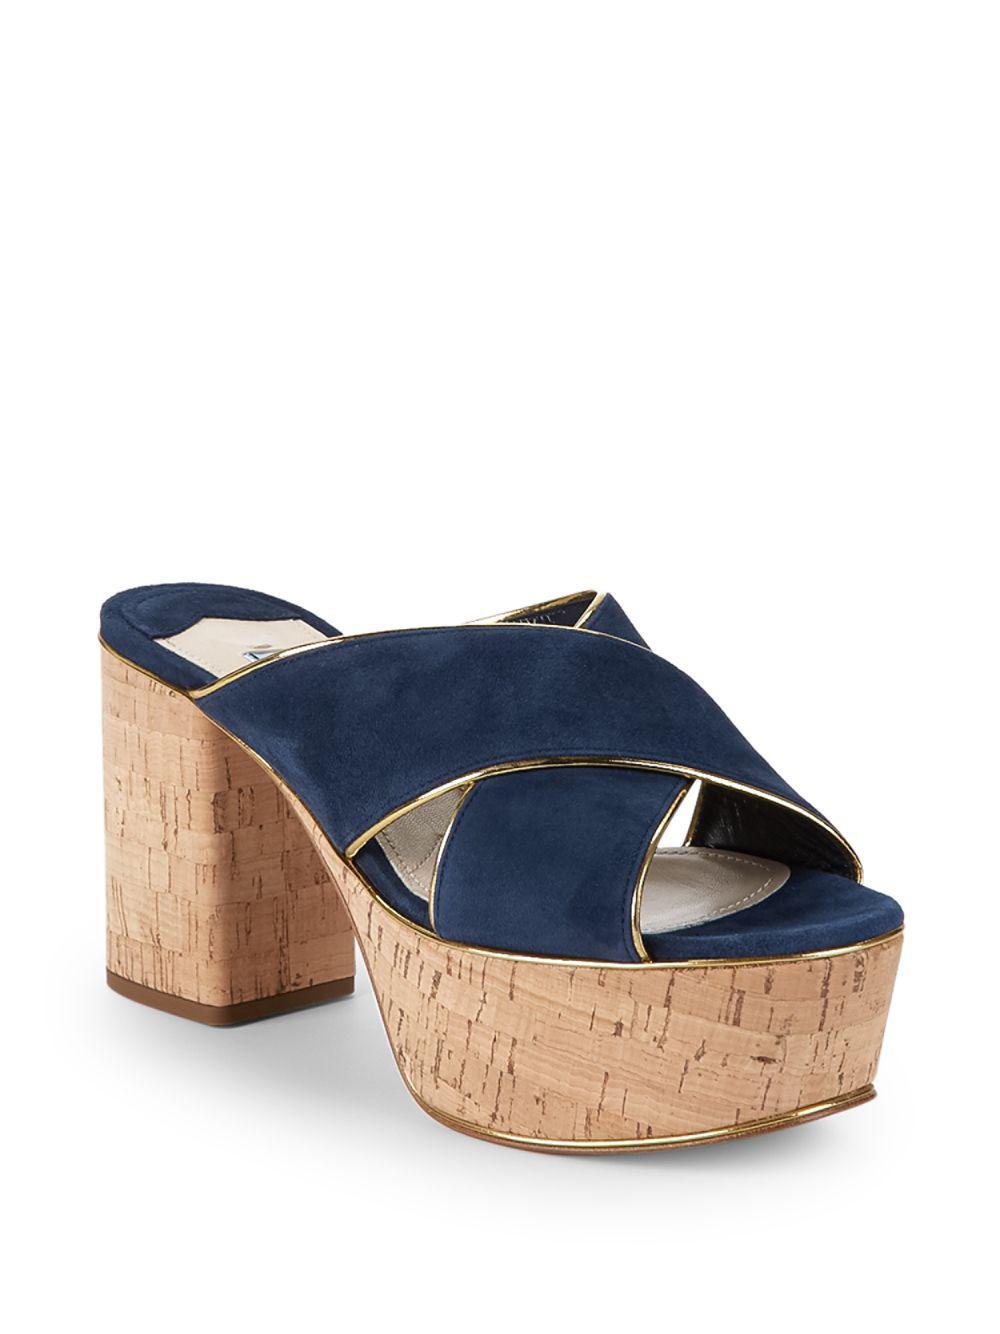 7603e37c0134 Lyst - Prada Crisscross Suede Platform Sandals in Blue